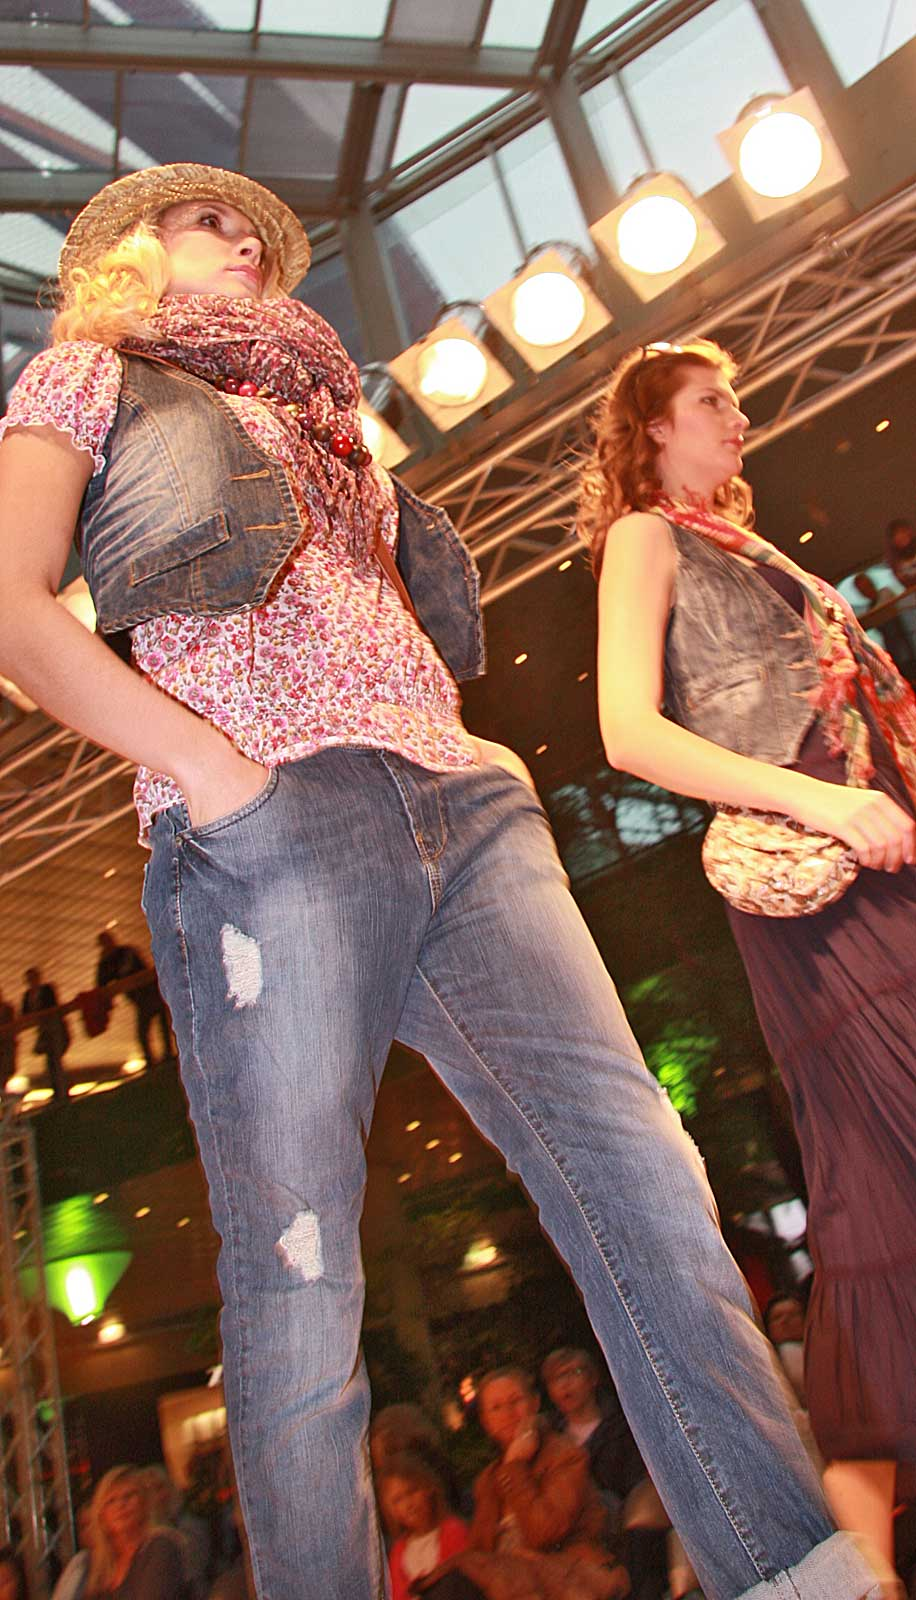 Salzburg-Cityguide - Foto - 18_03_2011_e_show_2_uwe_023.jpg